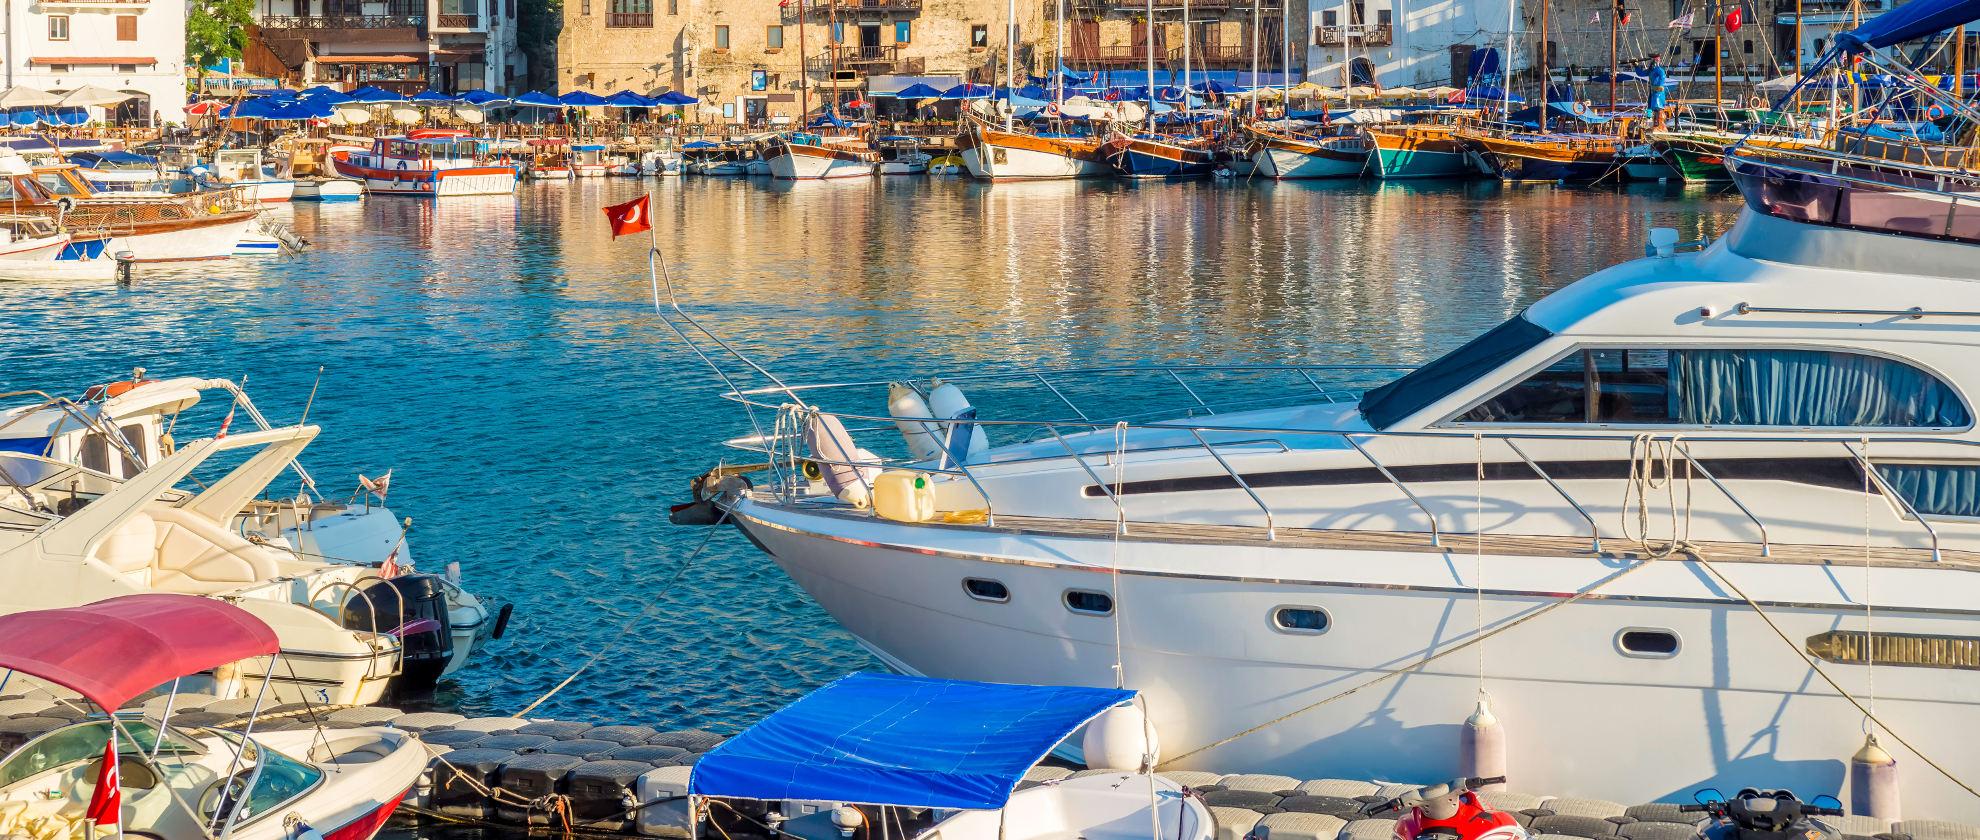 Travel Bucketlist: Cyprus